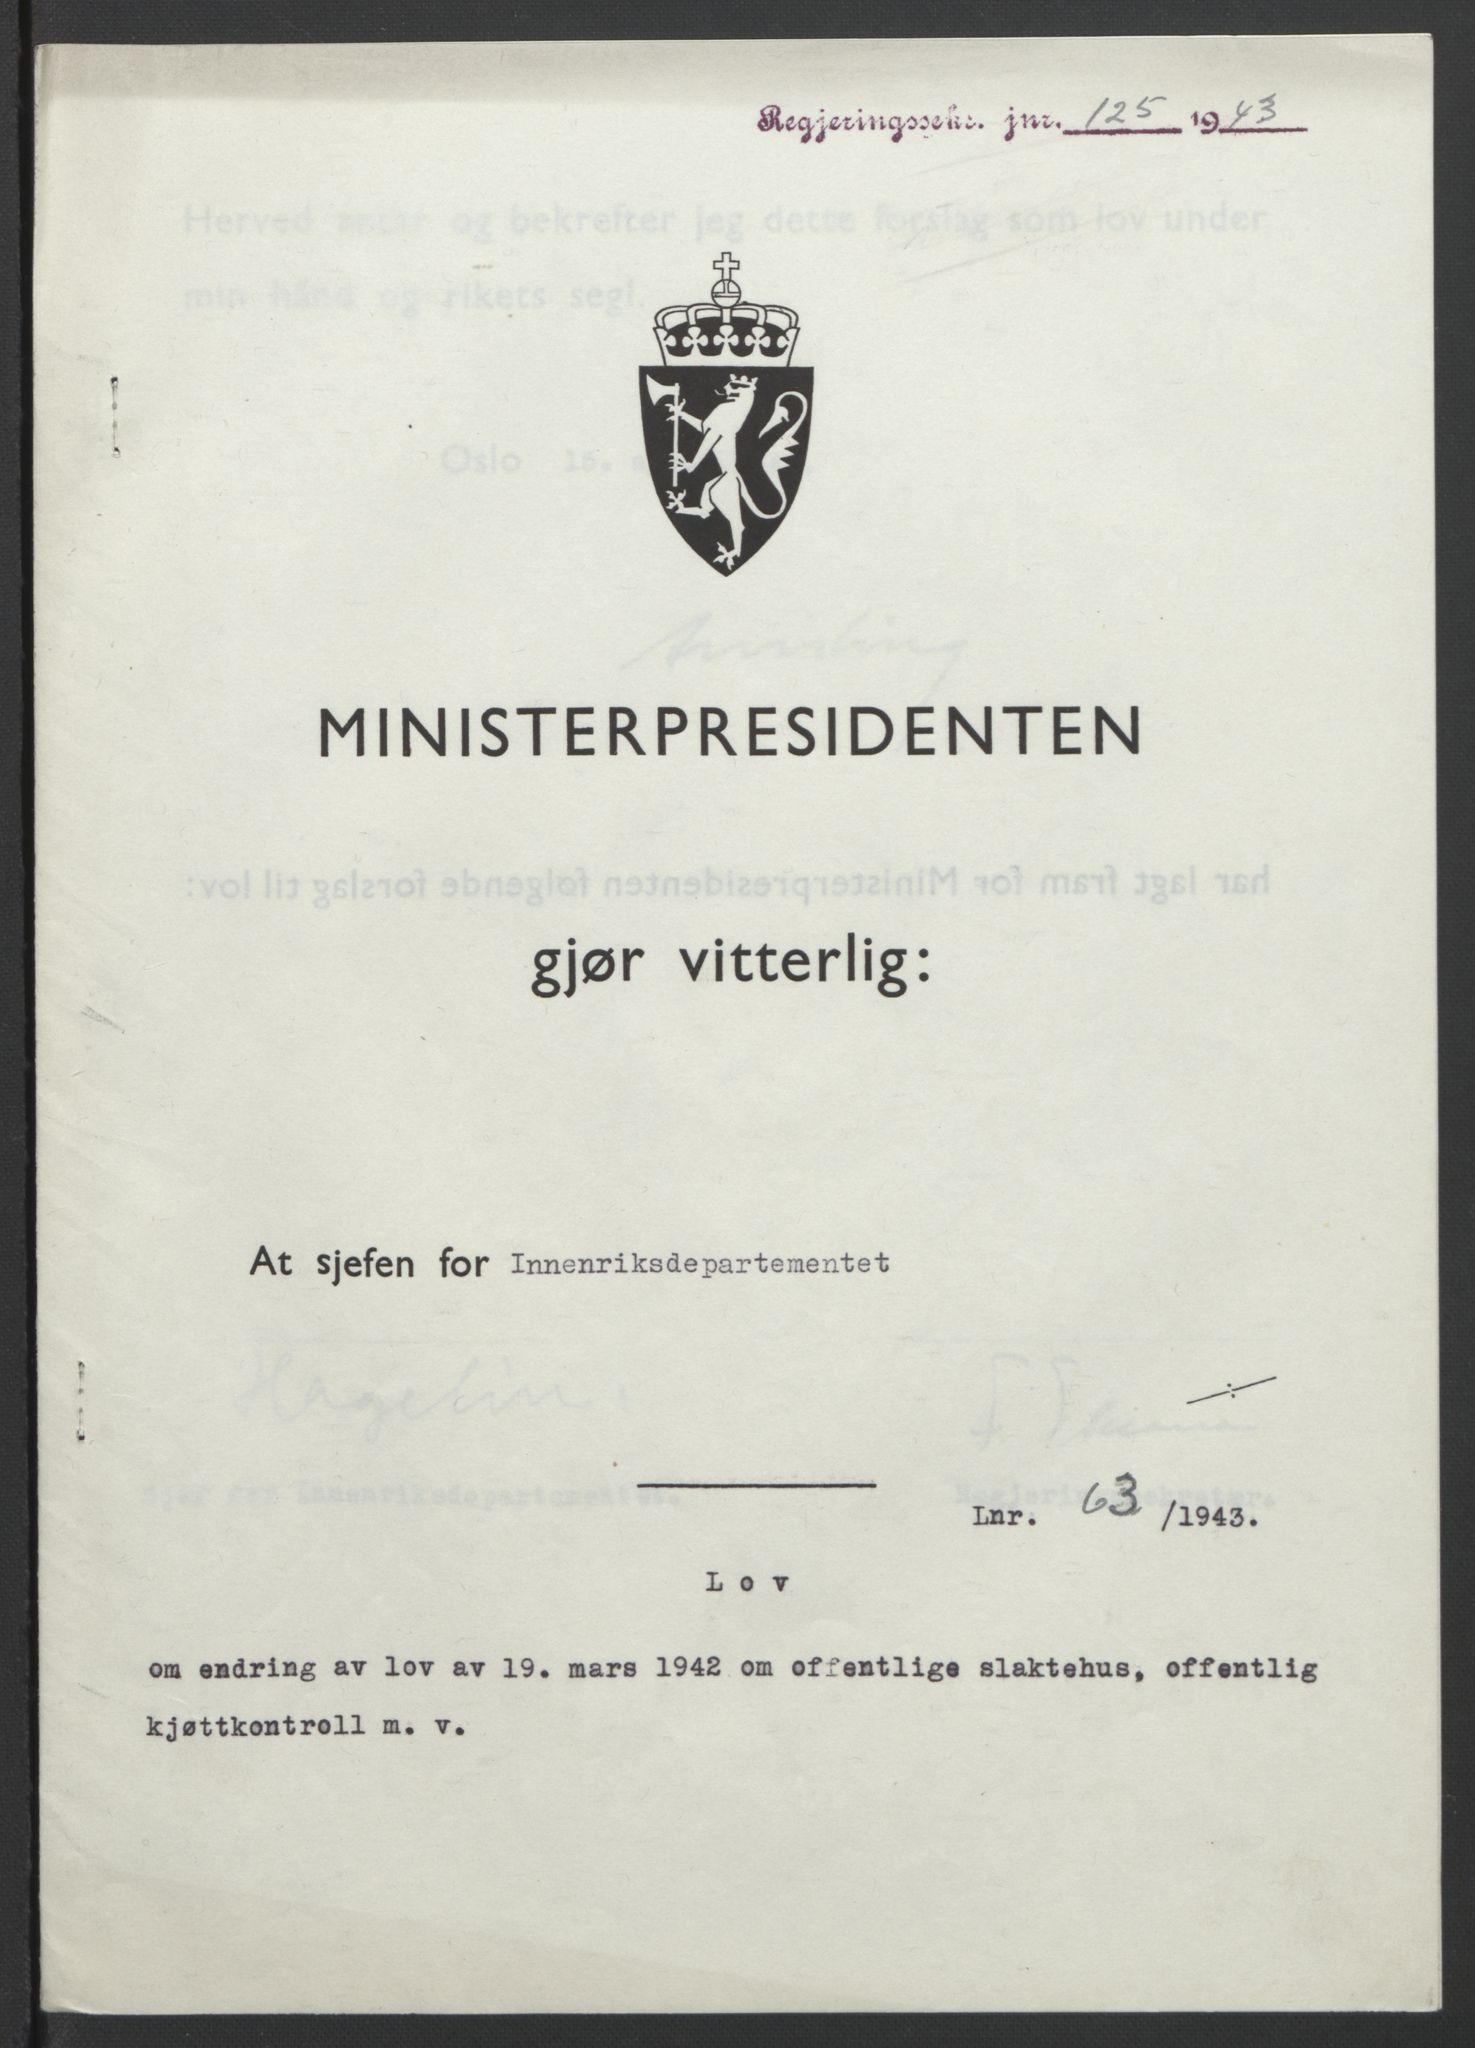 RA, NS-administrasjonen 1940-1945 (Statsrådsekretariatet, de kommisariske statsråder mm), D/Db/L0099: Lover, 1943, s. 293